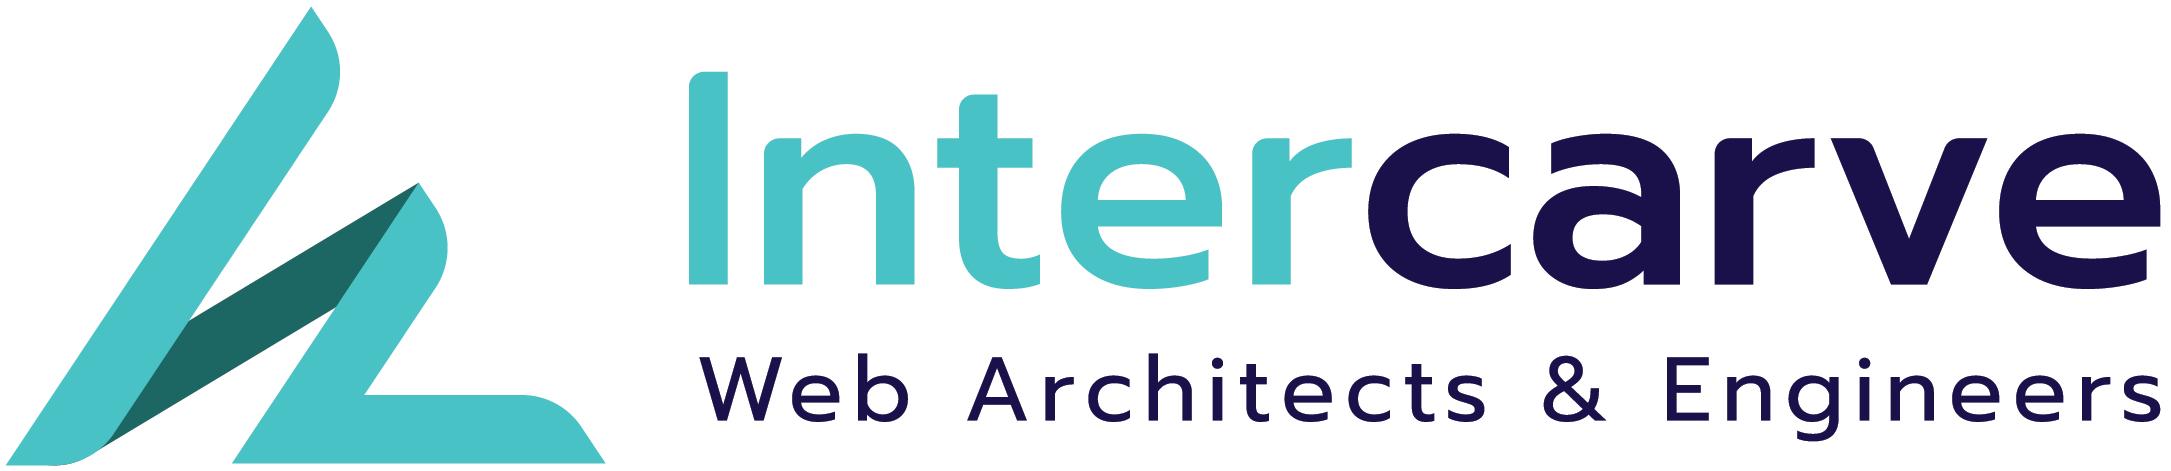 Intercarve logo